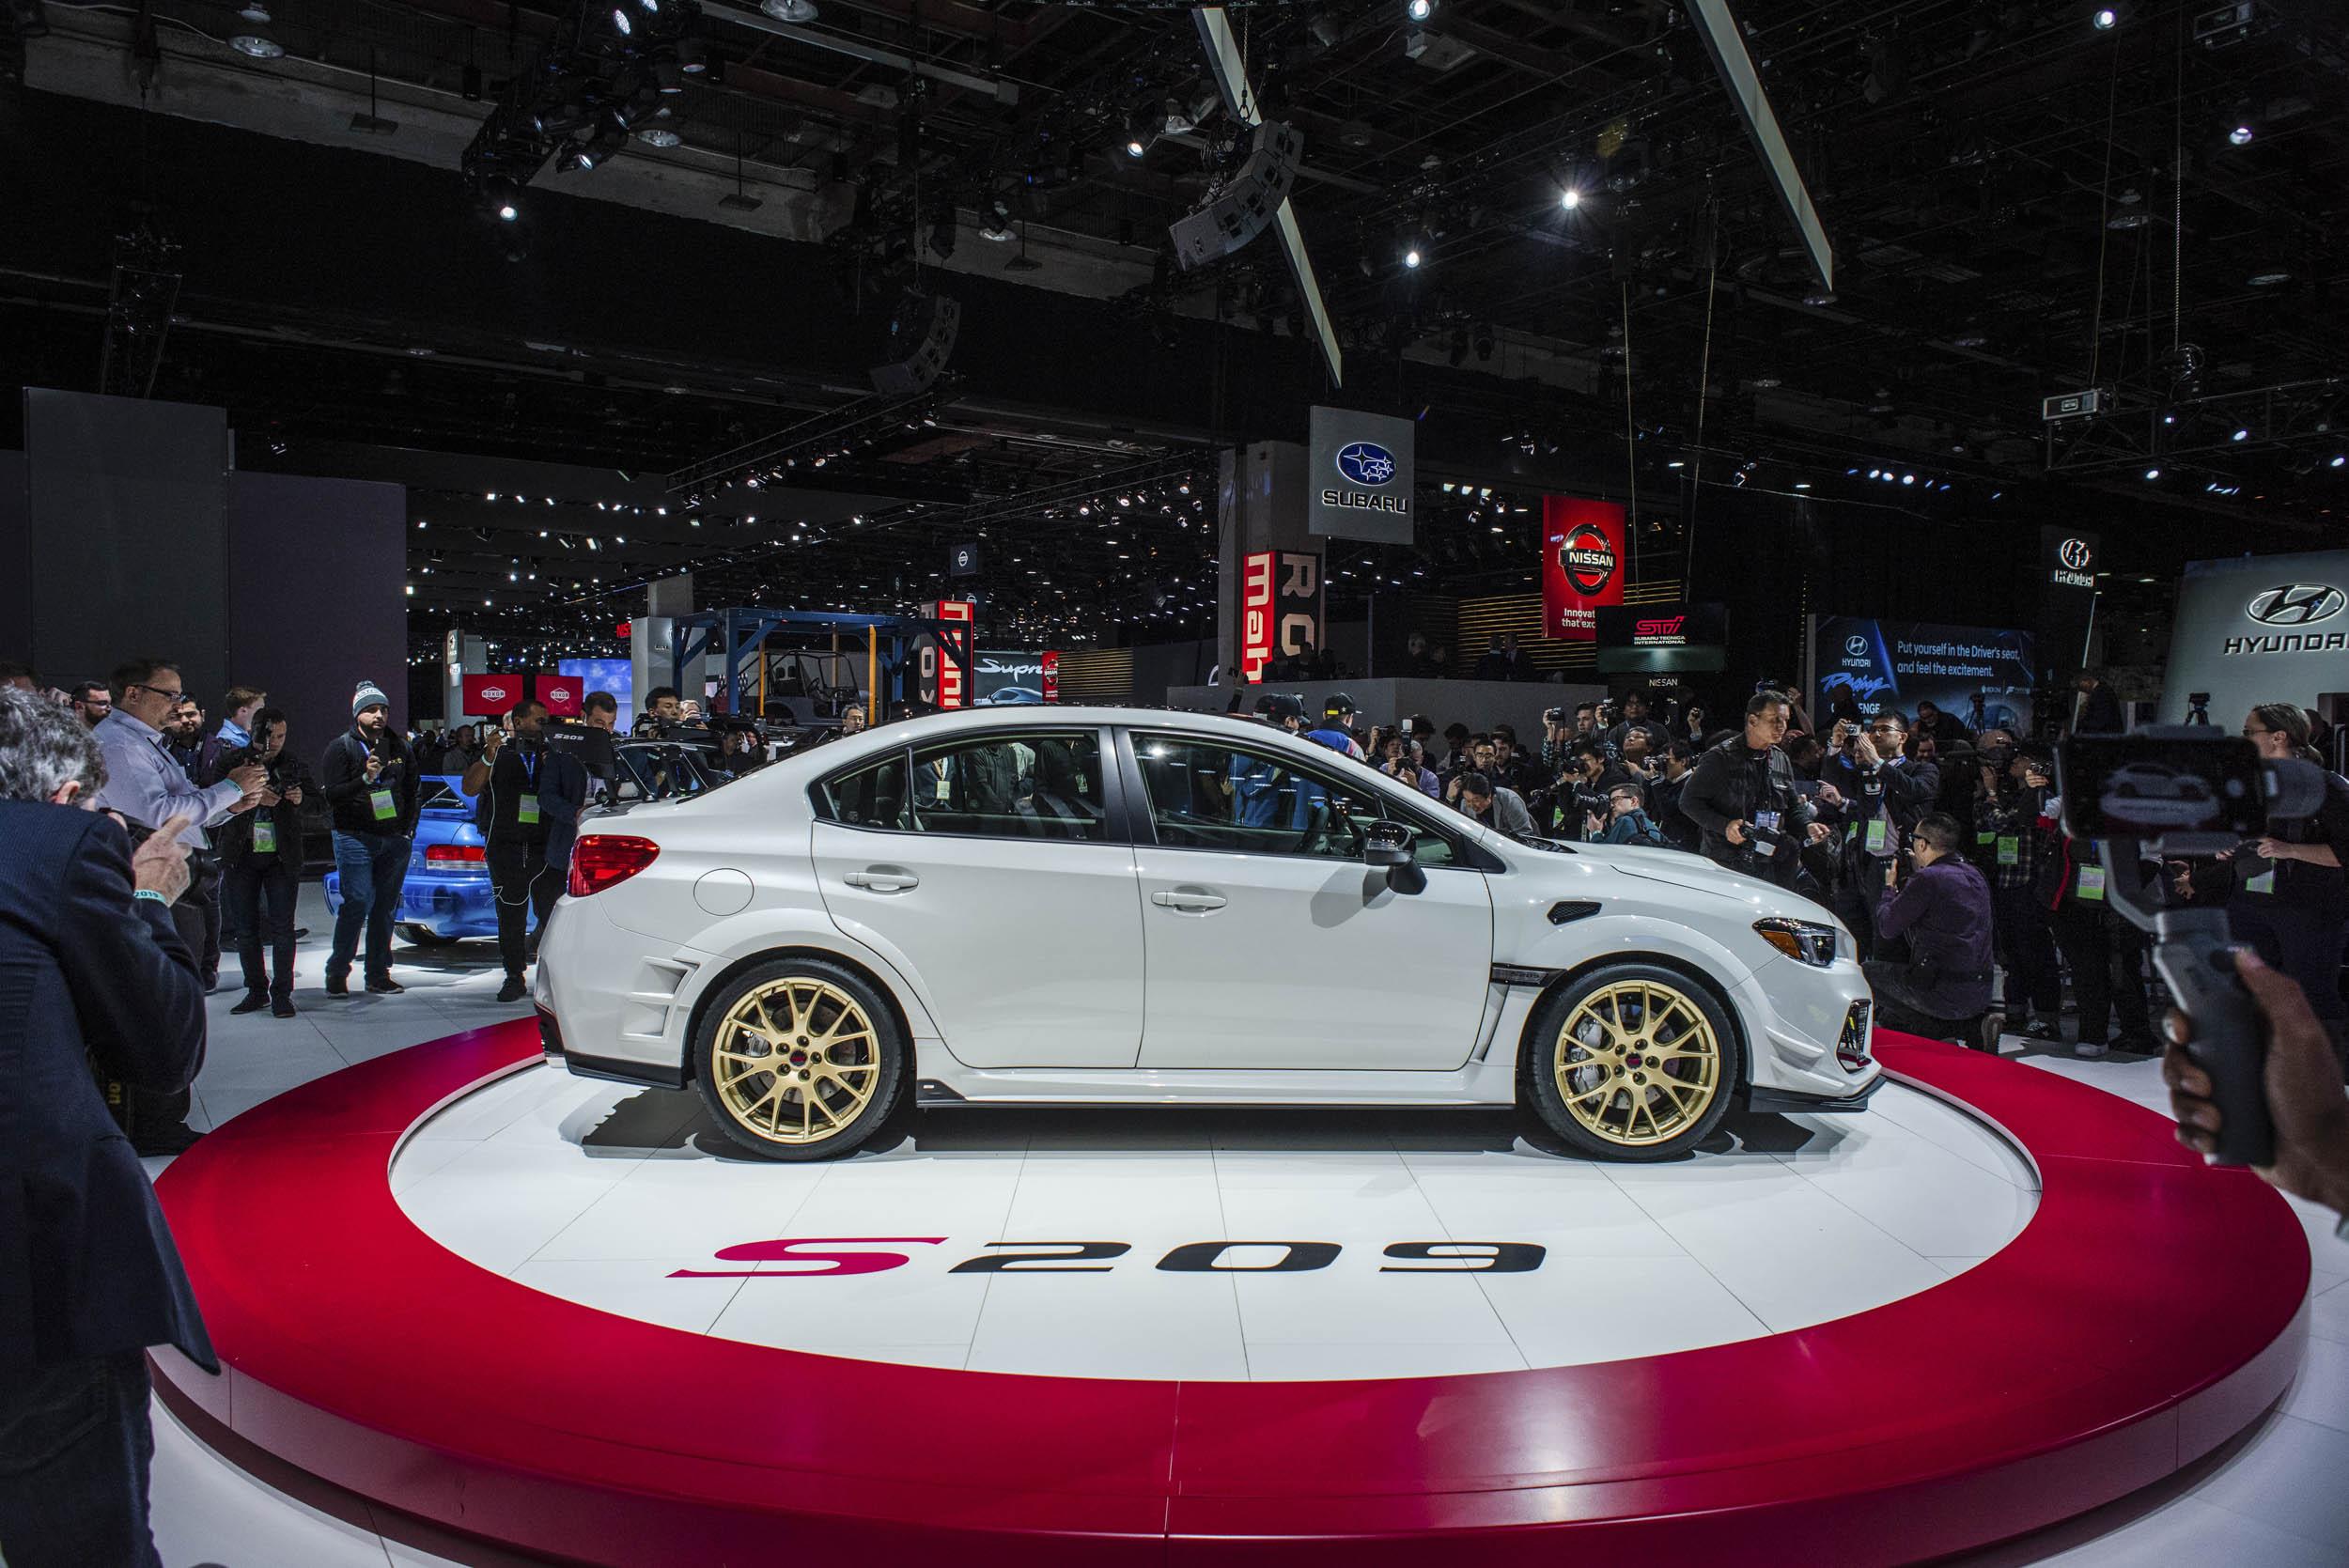 2020 Subaru WRX STI S209 profile side profile at the NAIAS